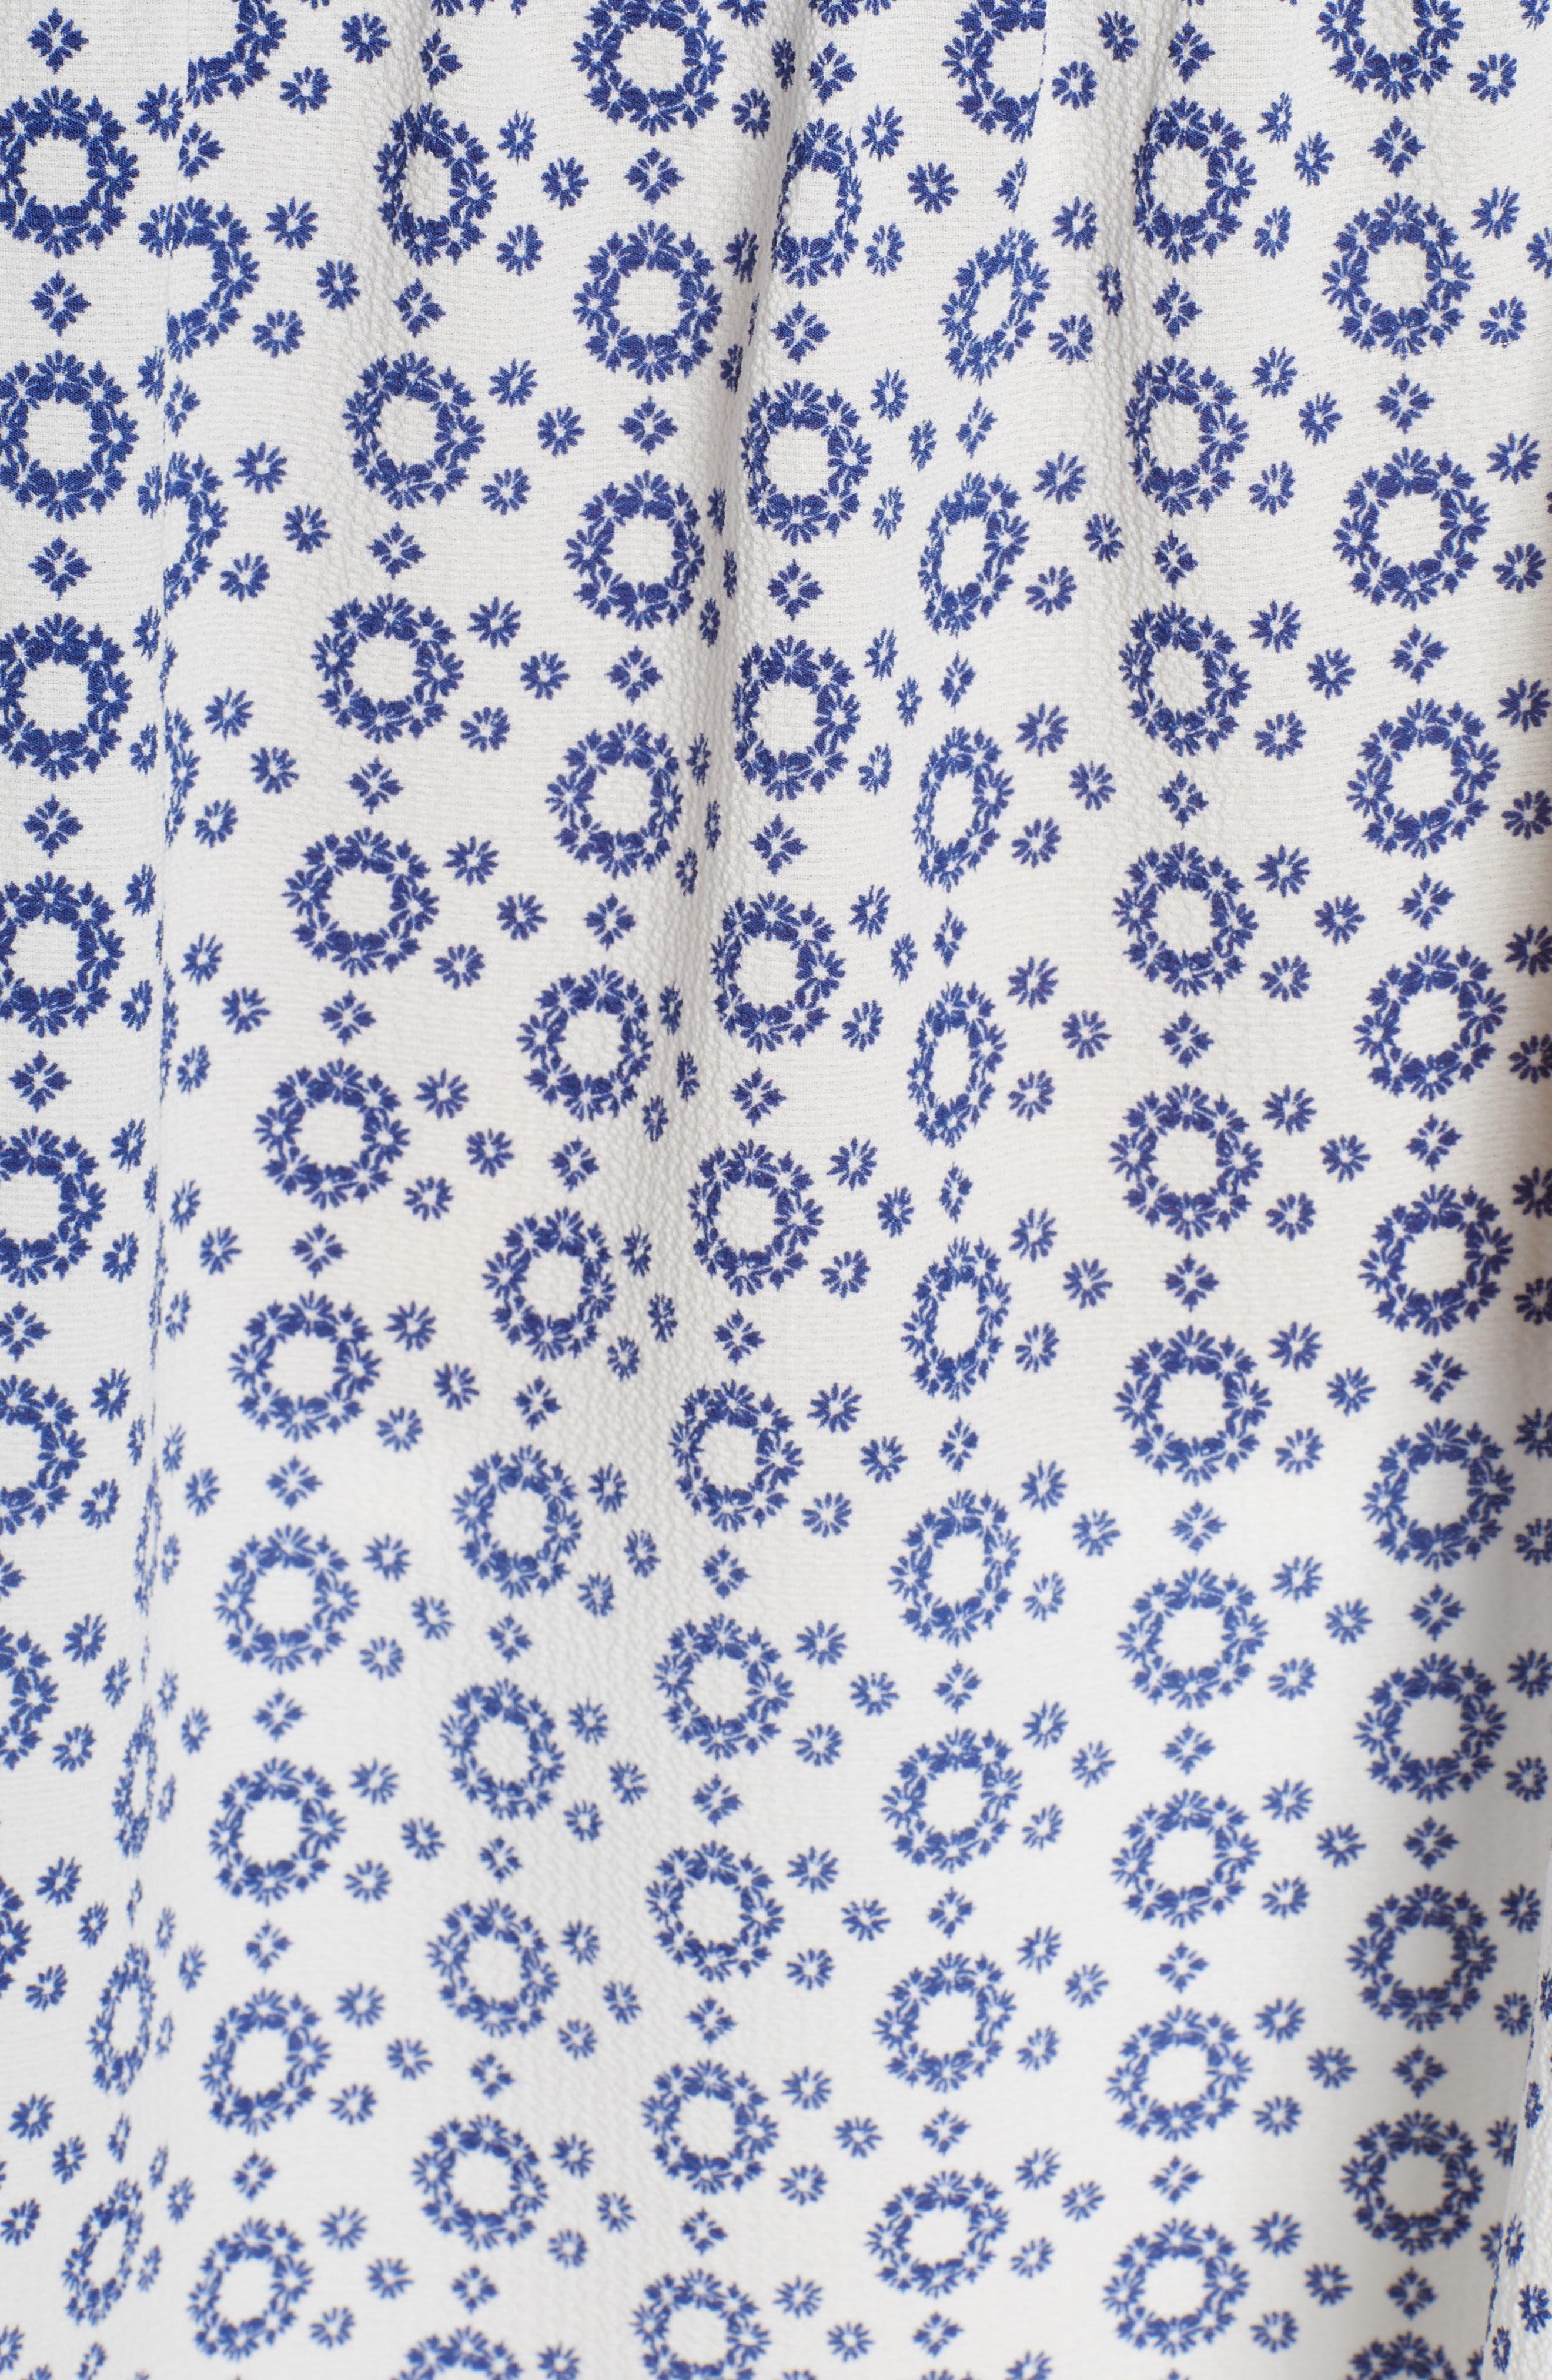 GIBSON, x International Women's Day Lindsey Crochet Detail Babydoll Blouse, Alternate thumbnail 5, color, WHITE/ NAVY GEO